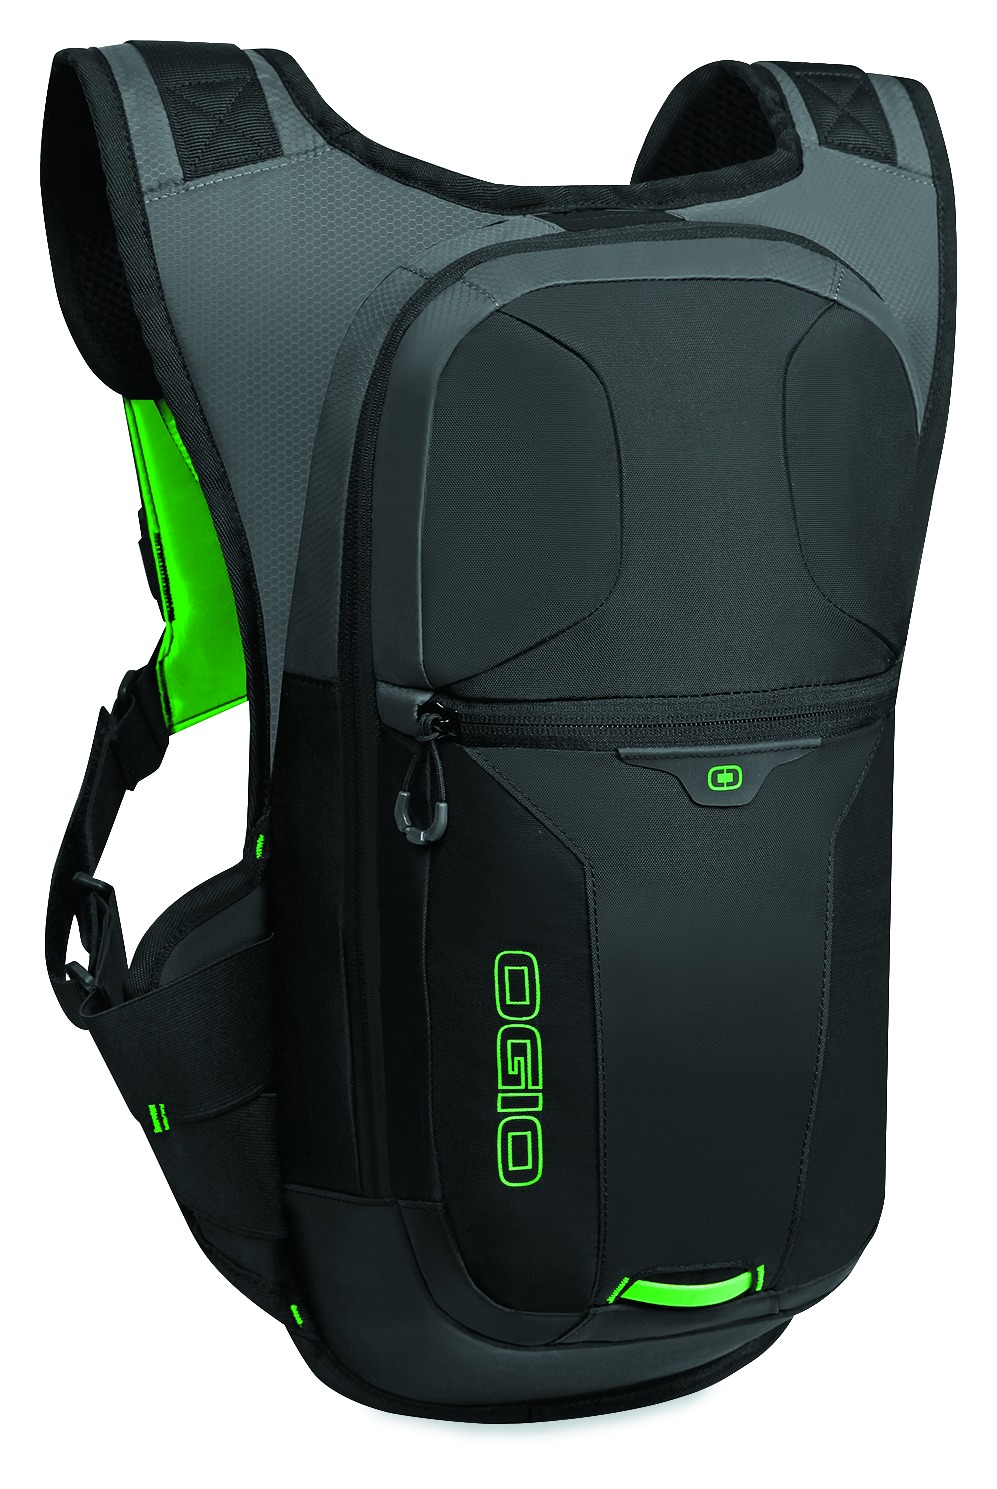 OGIO Atlas 3L Hydration Pack - RevZilla